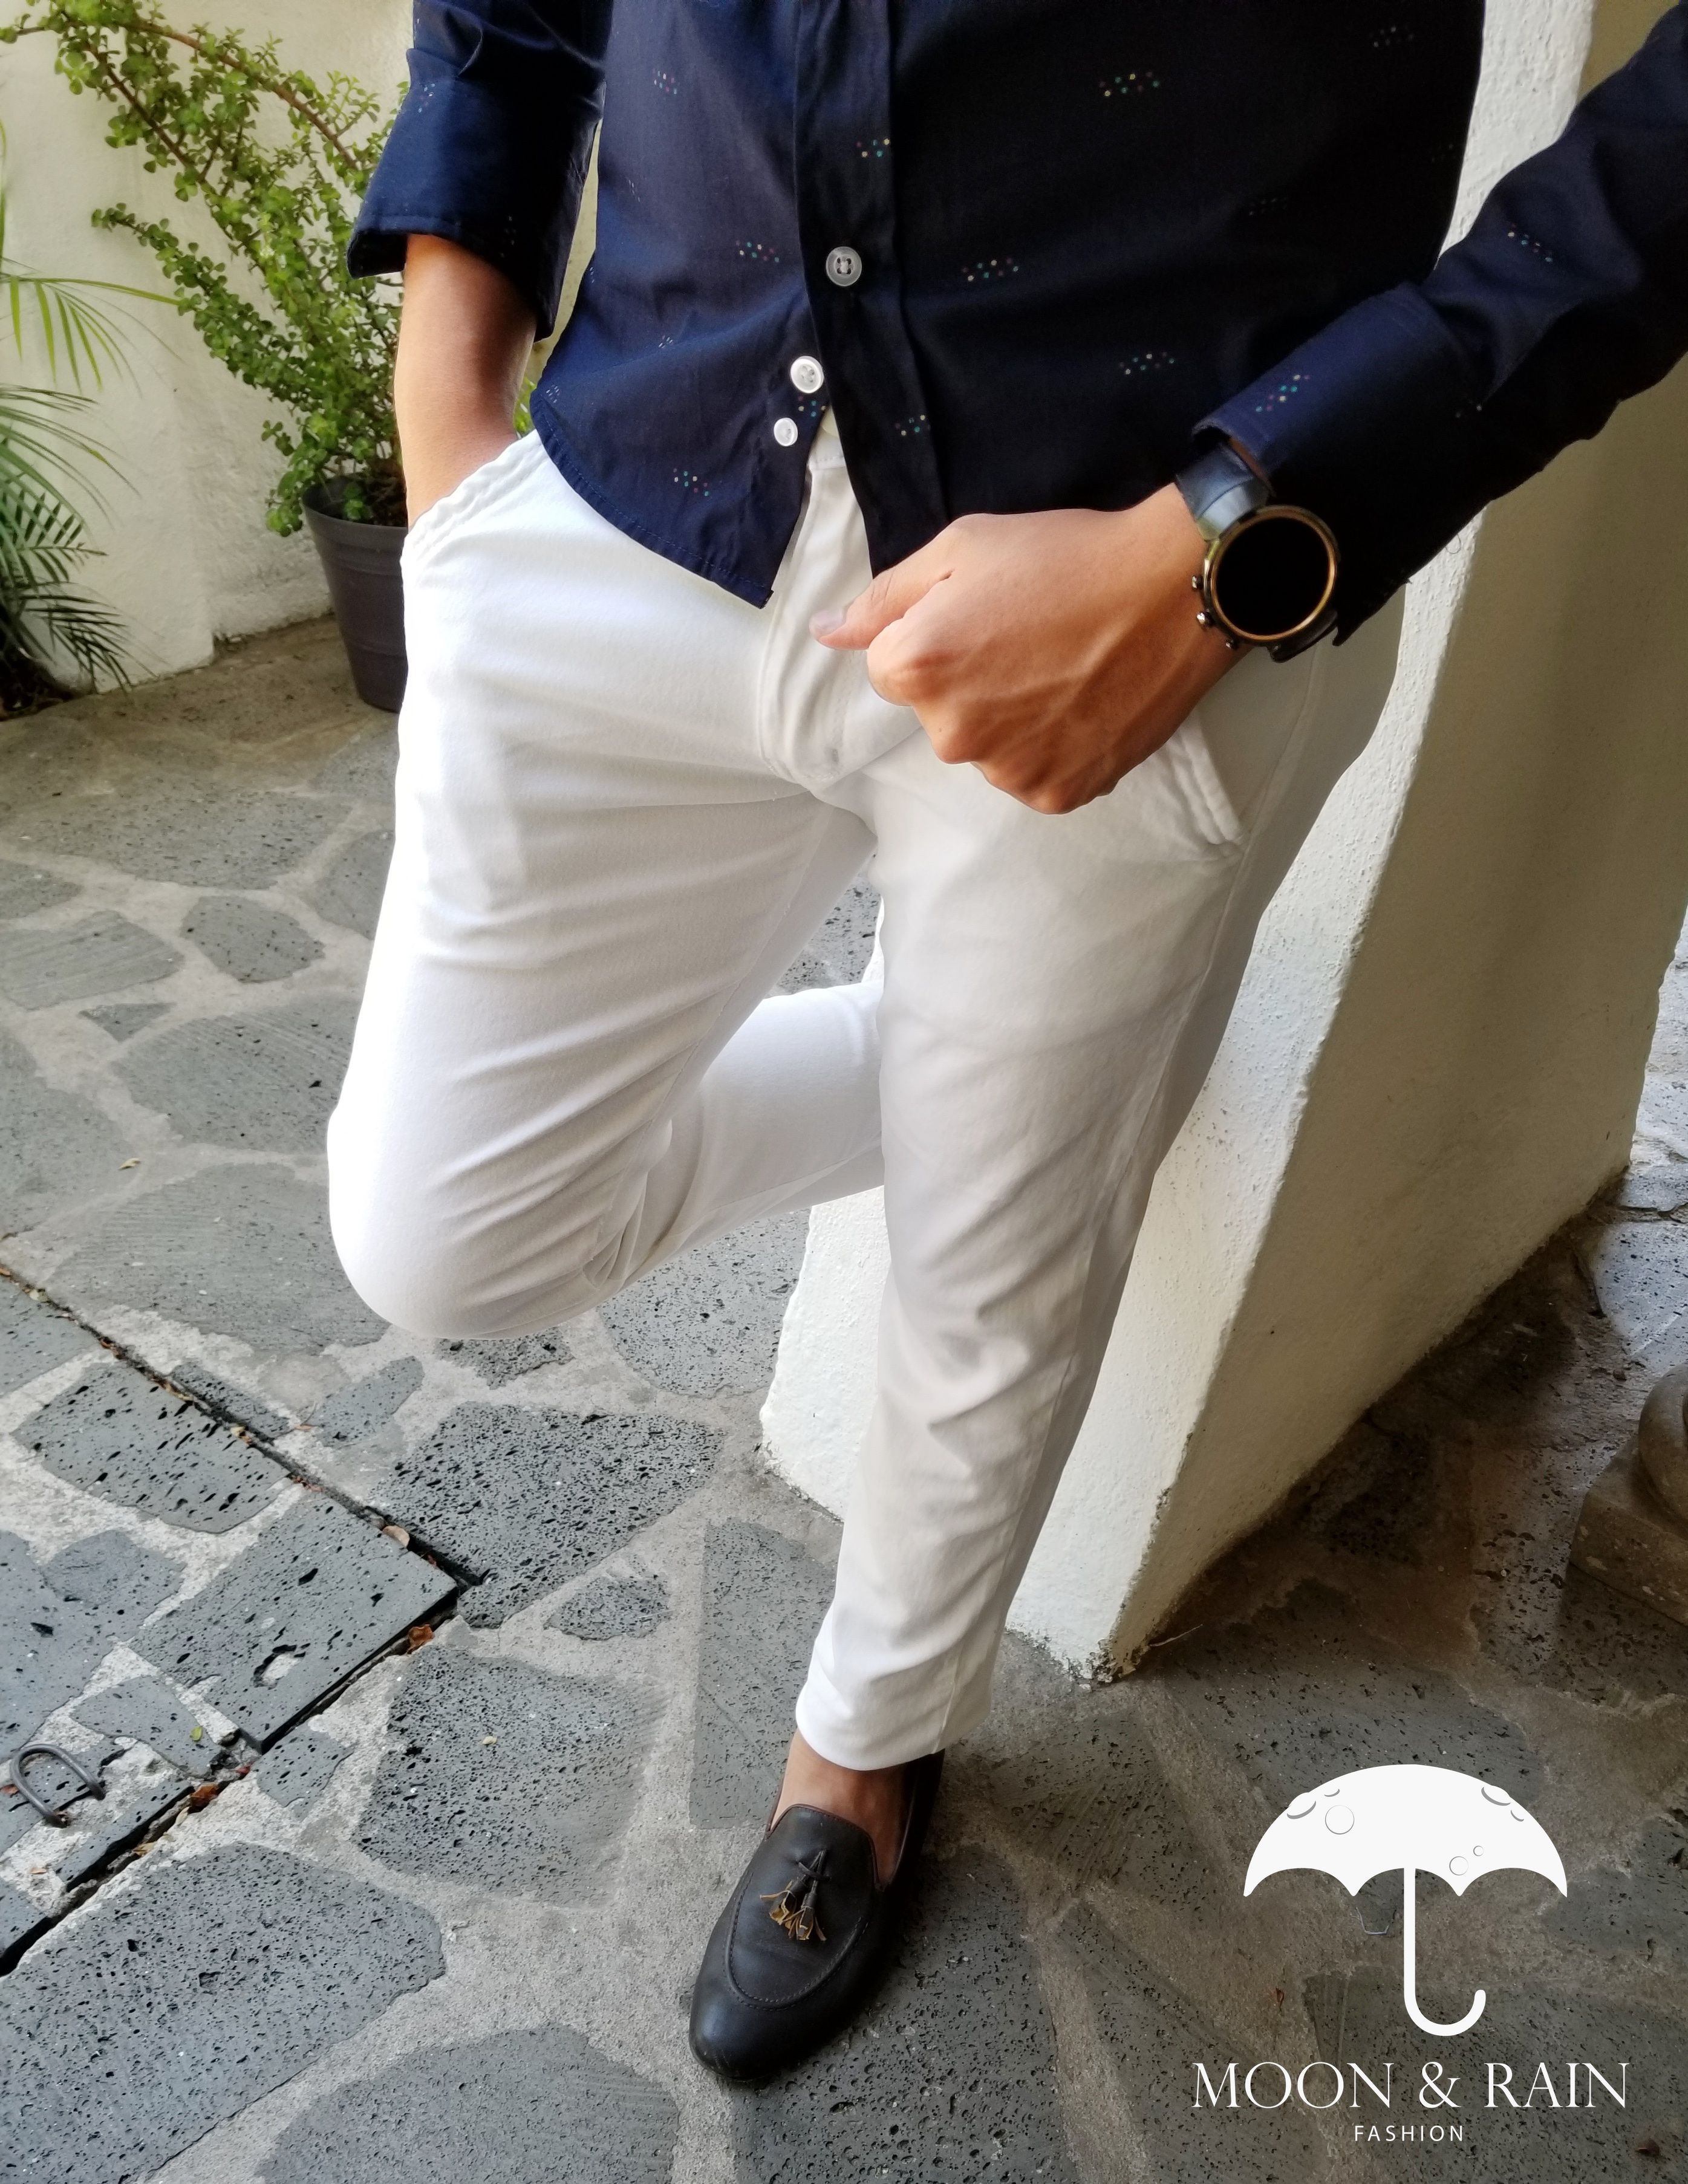 Outfit Para Hombre Pantalon Skinny De Gabardina Blanca Mocasin Chocolate Disenos De La Marca Moon Ropa Casual Hombres Ropa Casual Hombre Maduro Pantalones